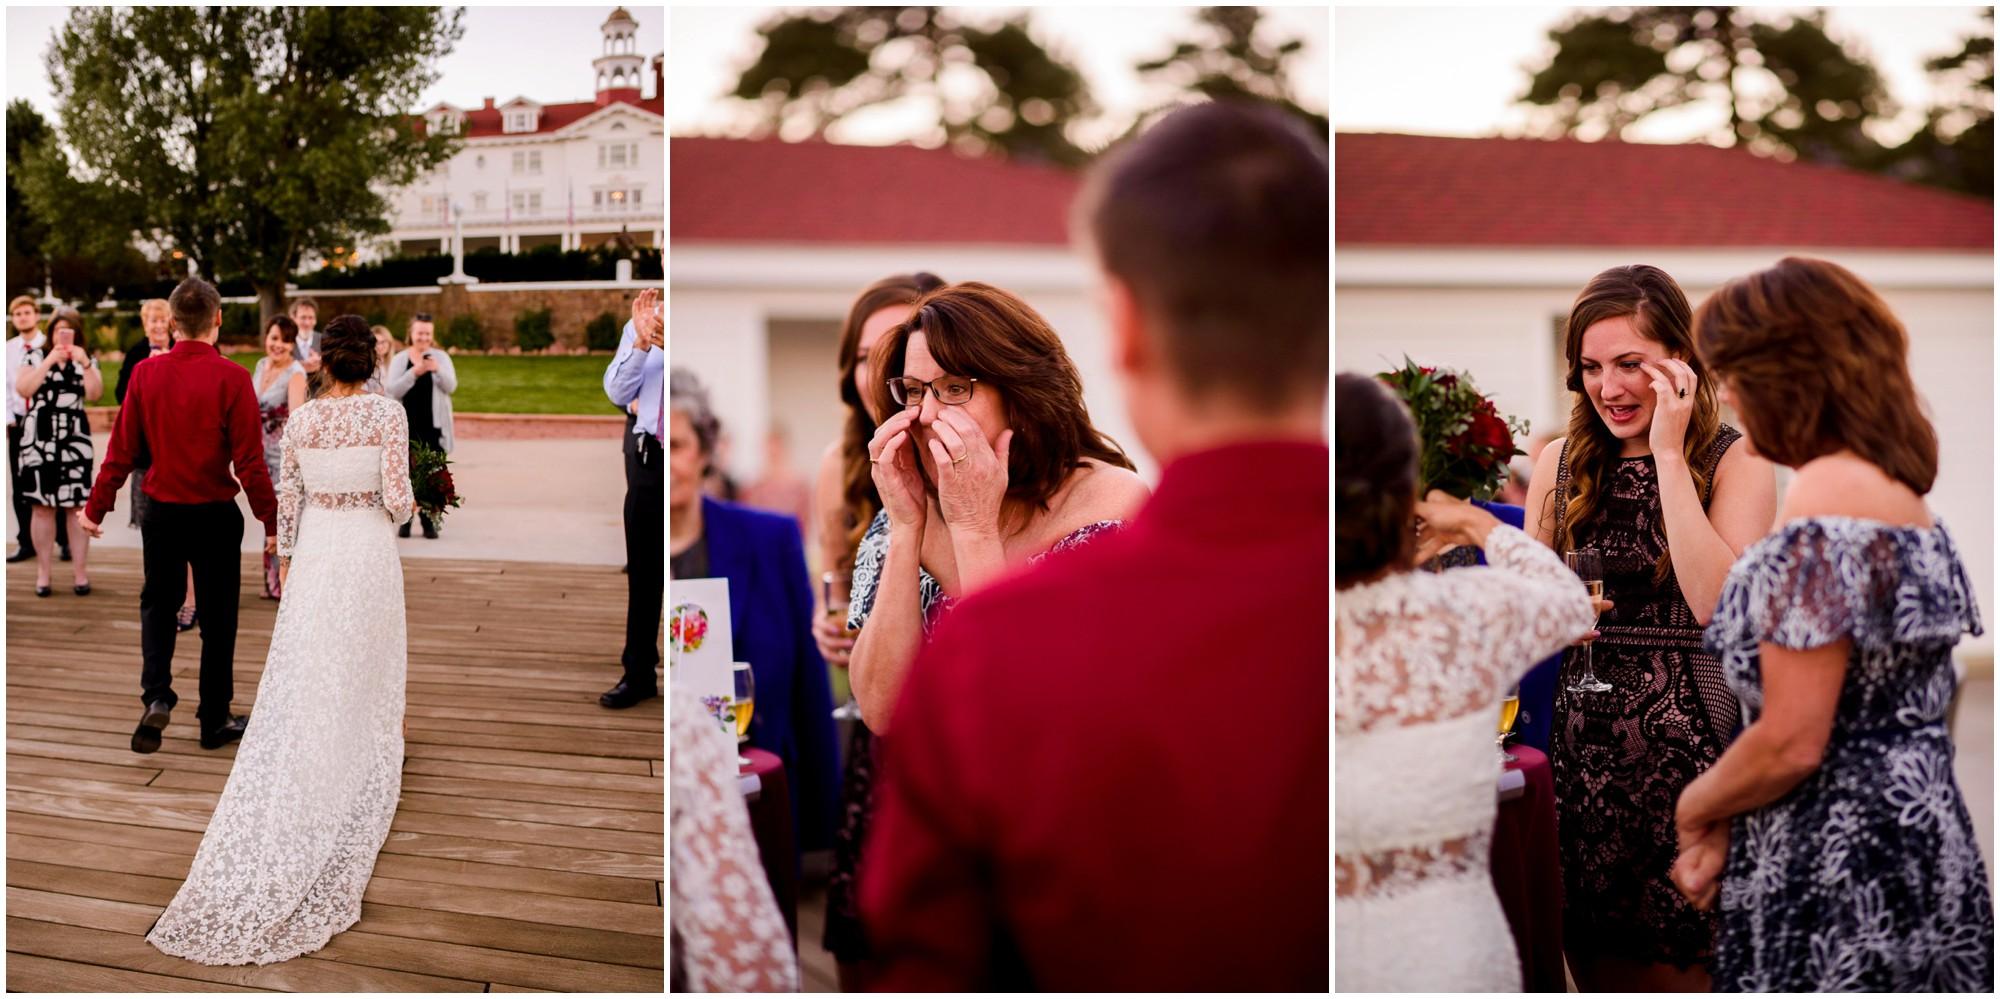 200-Estes-Park-Stanley-hotel-fall-wedding.jpg